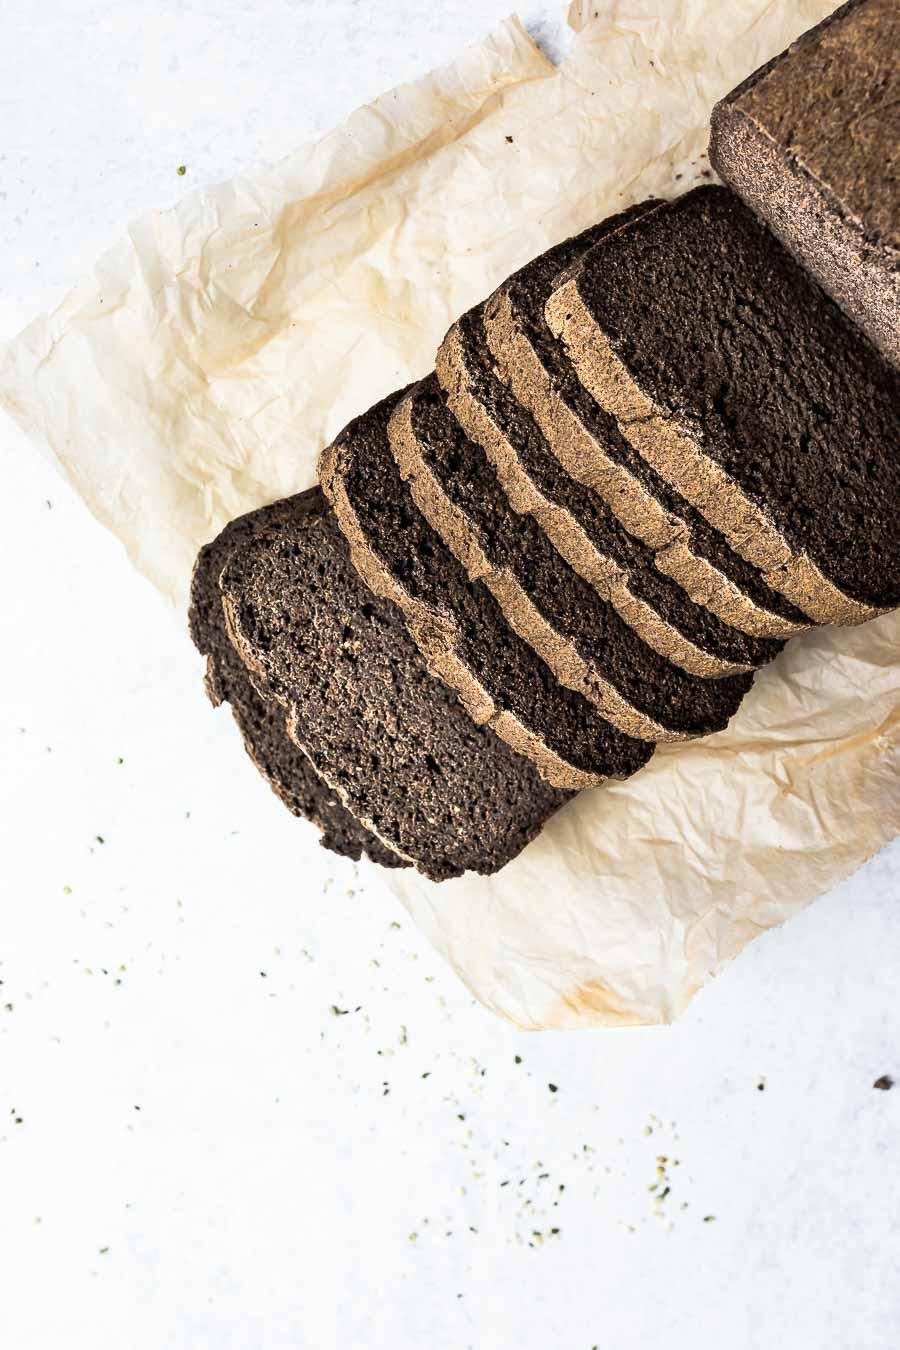 The Best Gluten-free Buckwheat Flour Bread (egg-free)